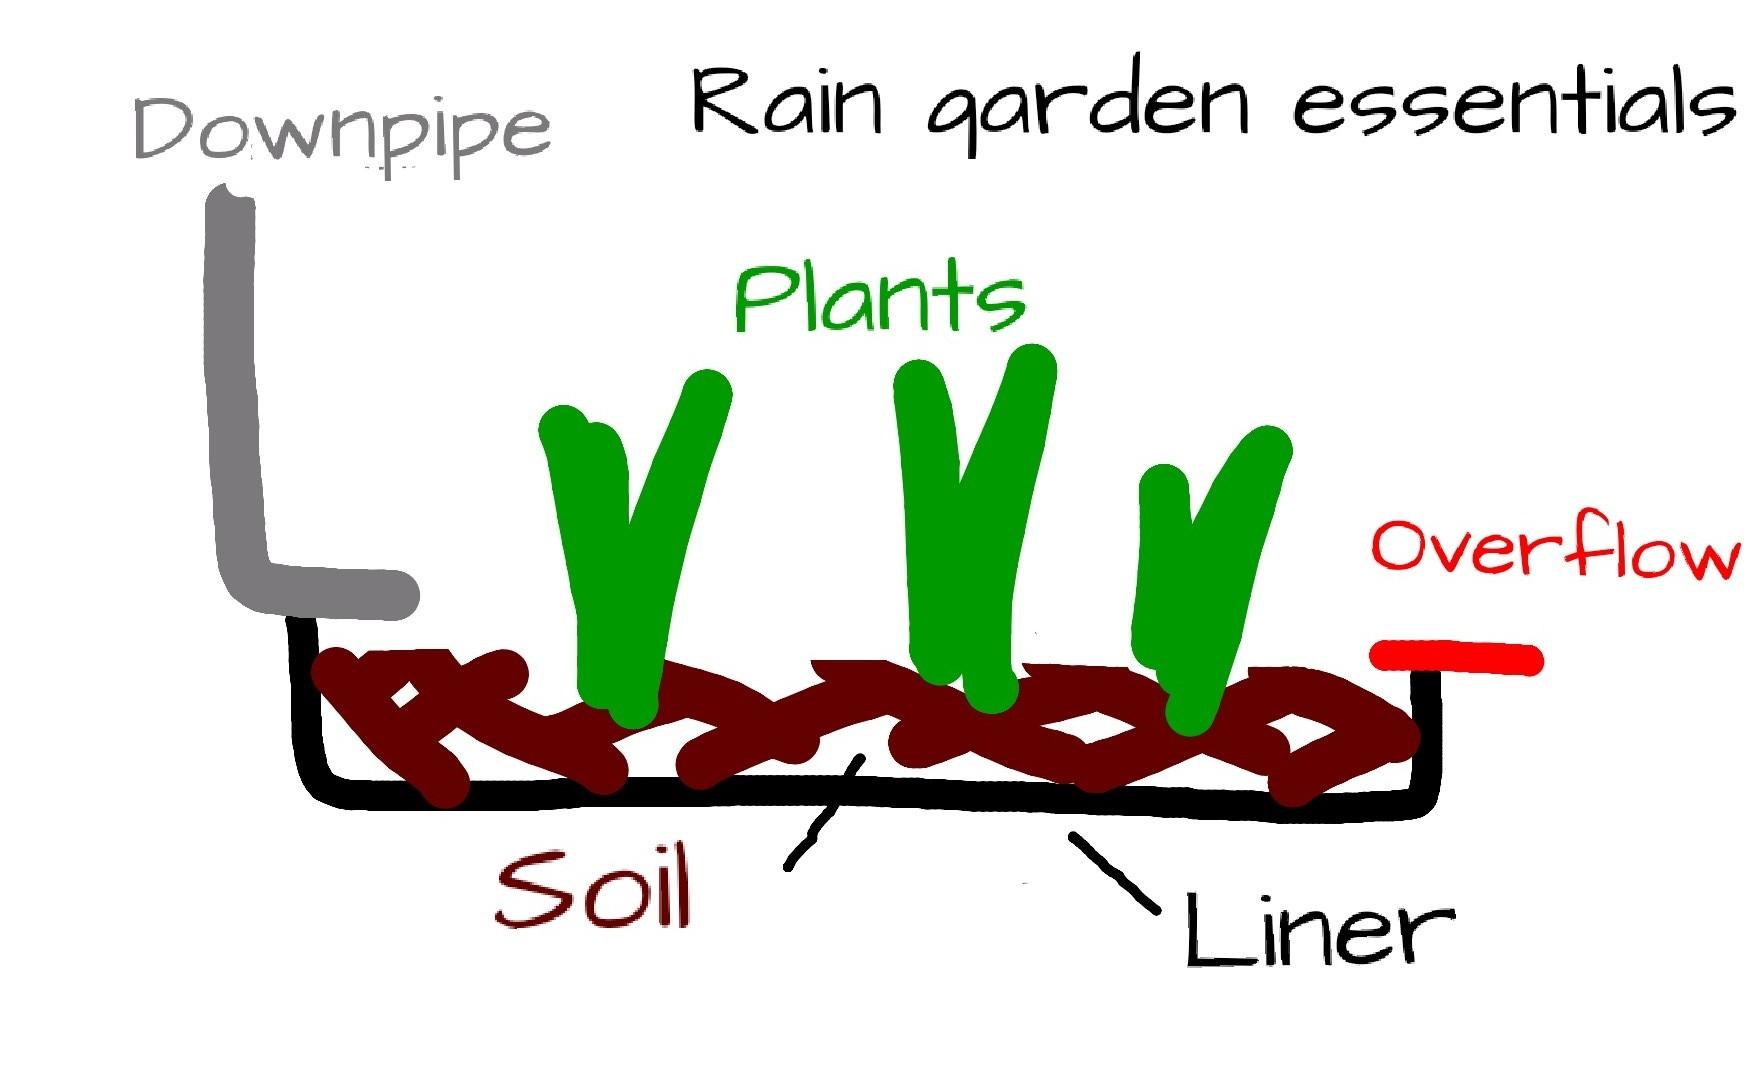 Essentials of a rain garden